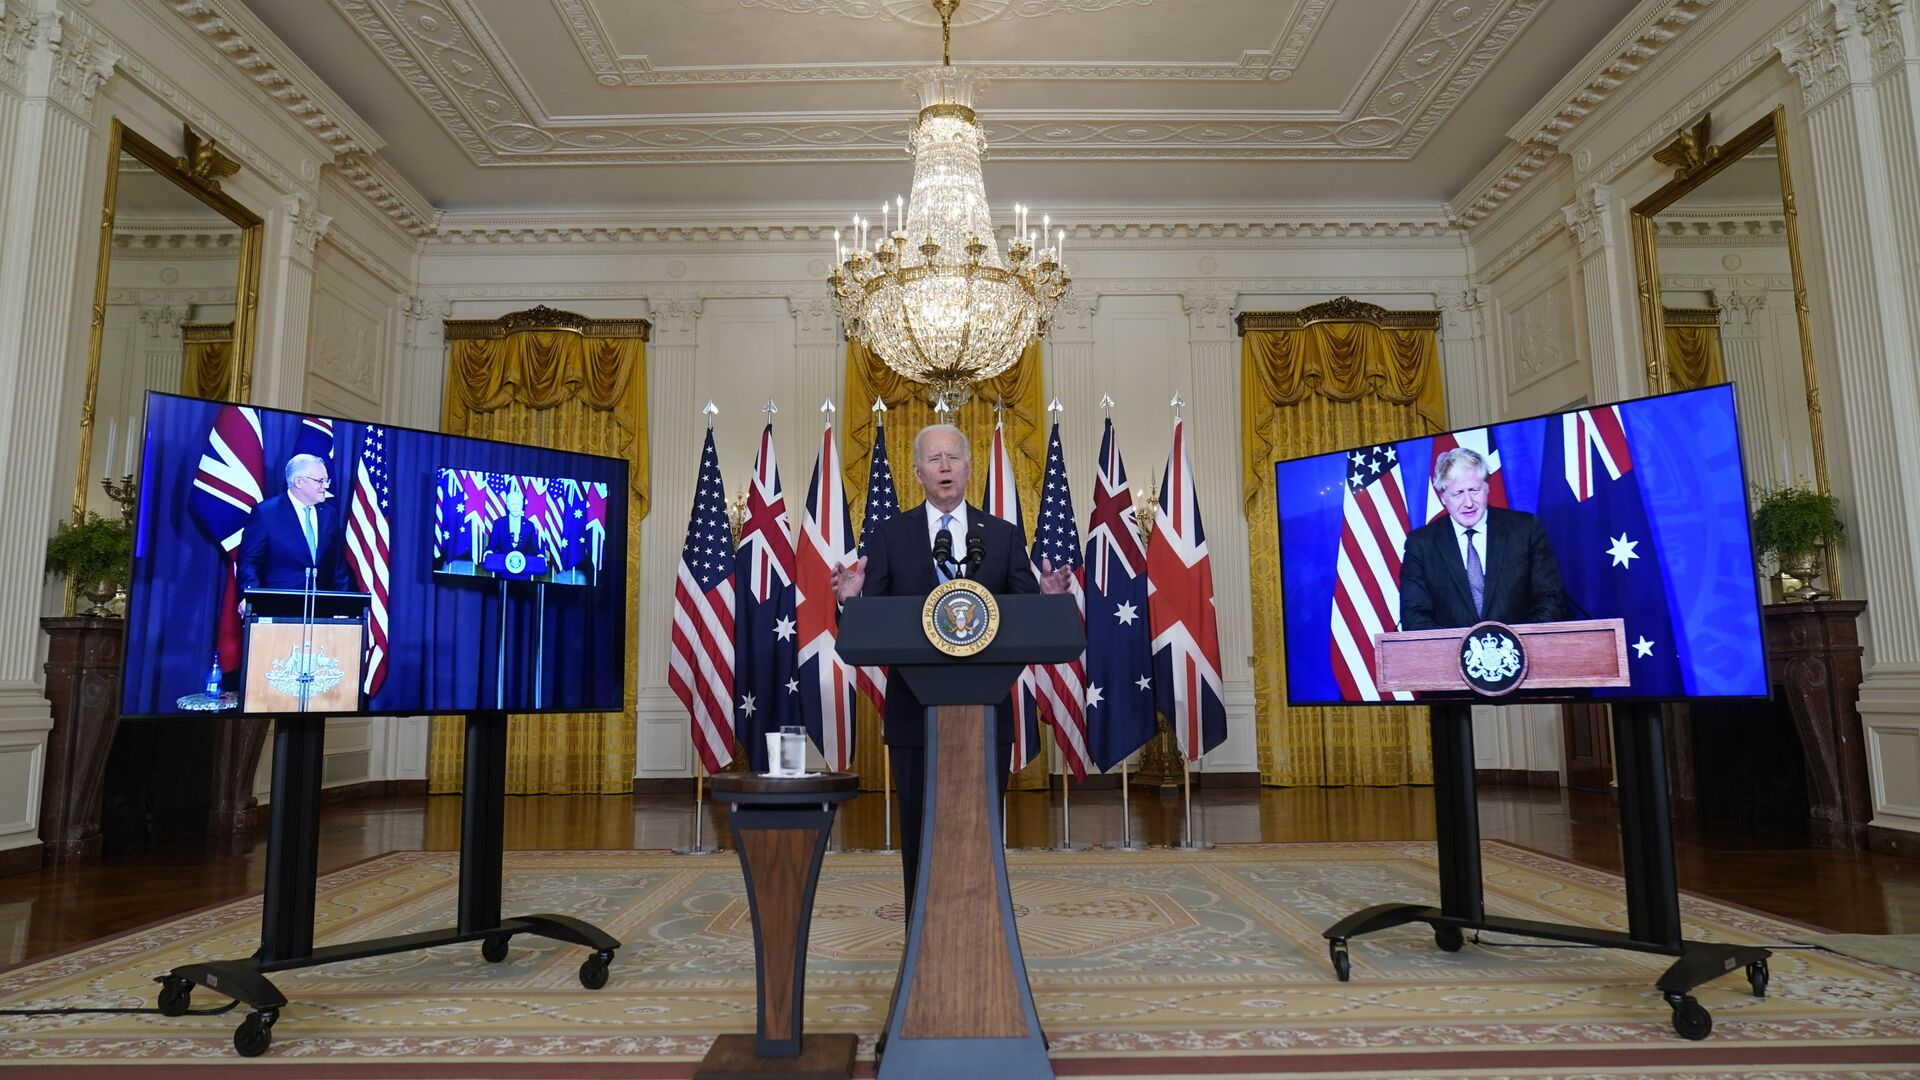 Predsednik SAD Džo Bajden, premijer Australije Skot Morison i premijer Velike Britanije Boris Džonson na sastanku povodom novog saveza AUKUS - Sputnik Srbija, 1920, 30.09.2021